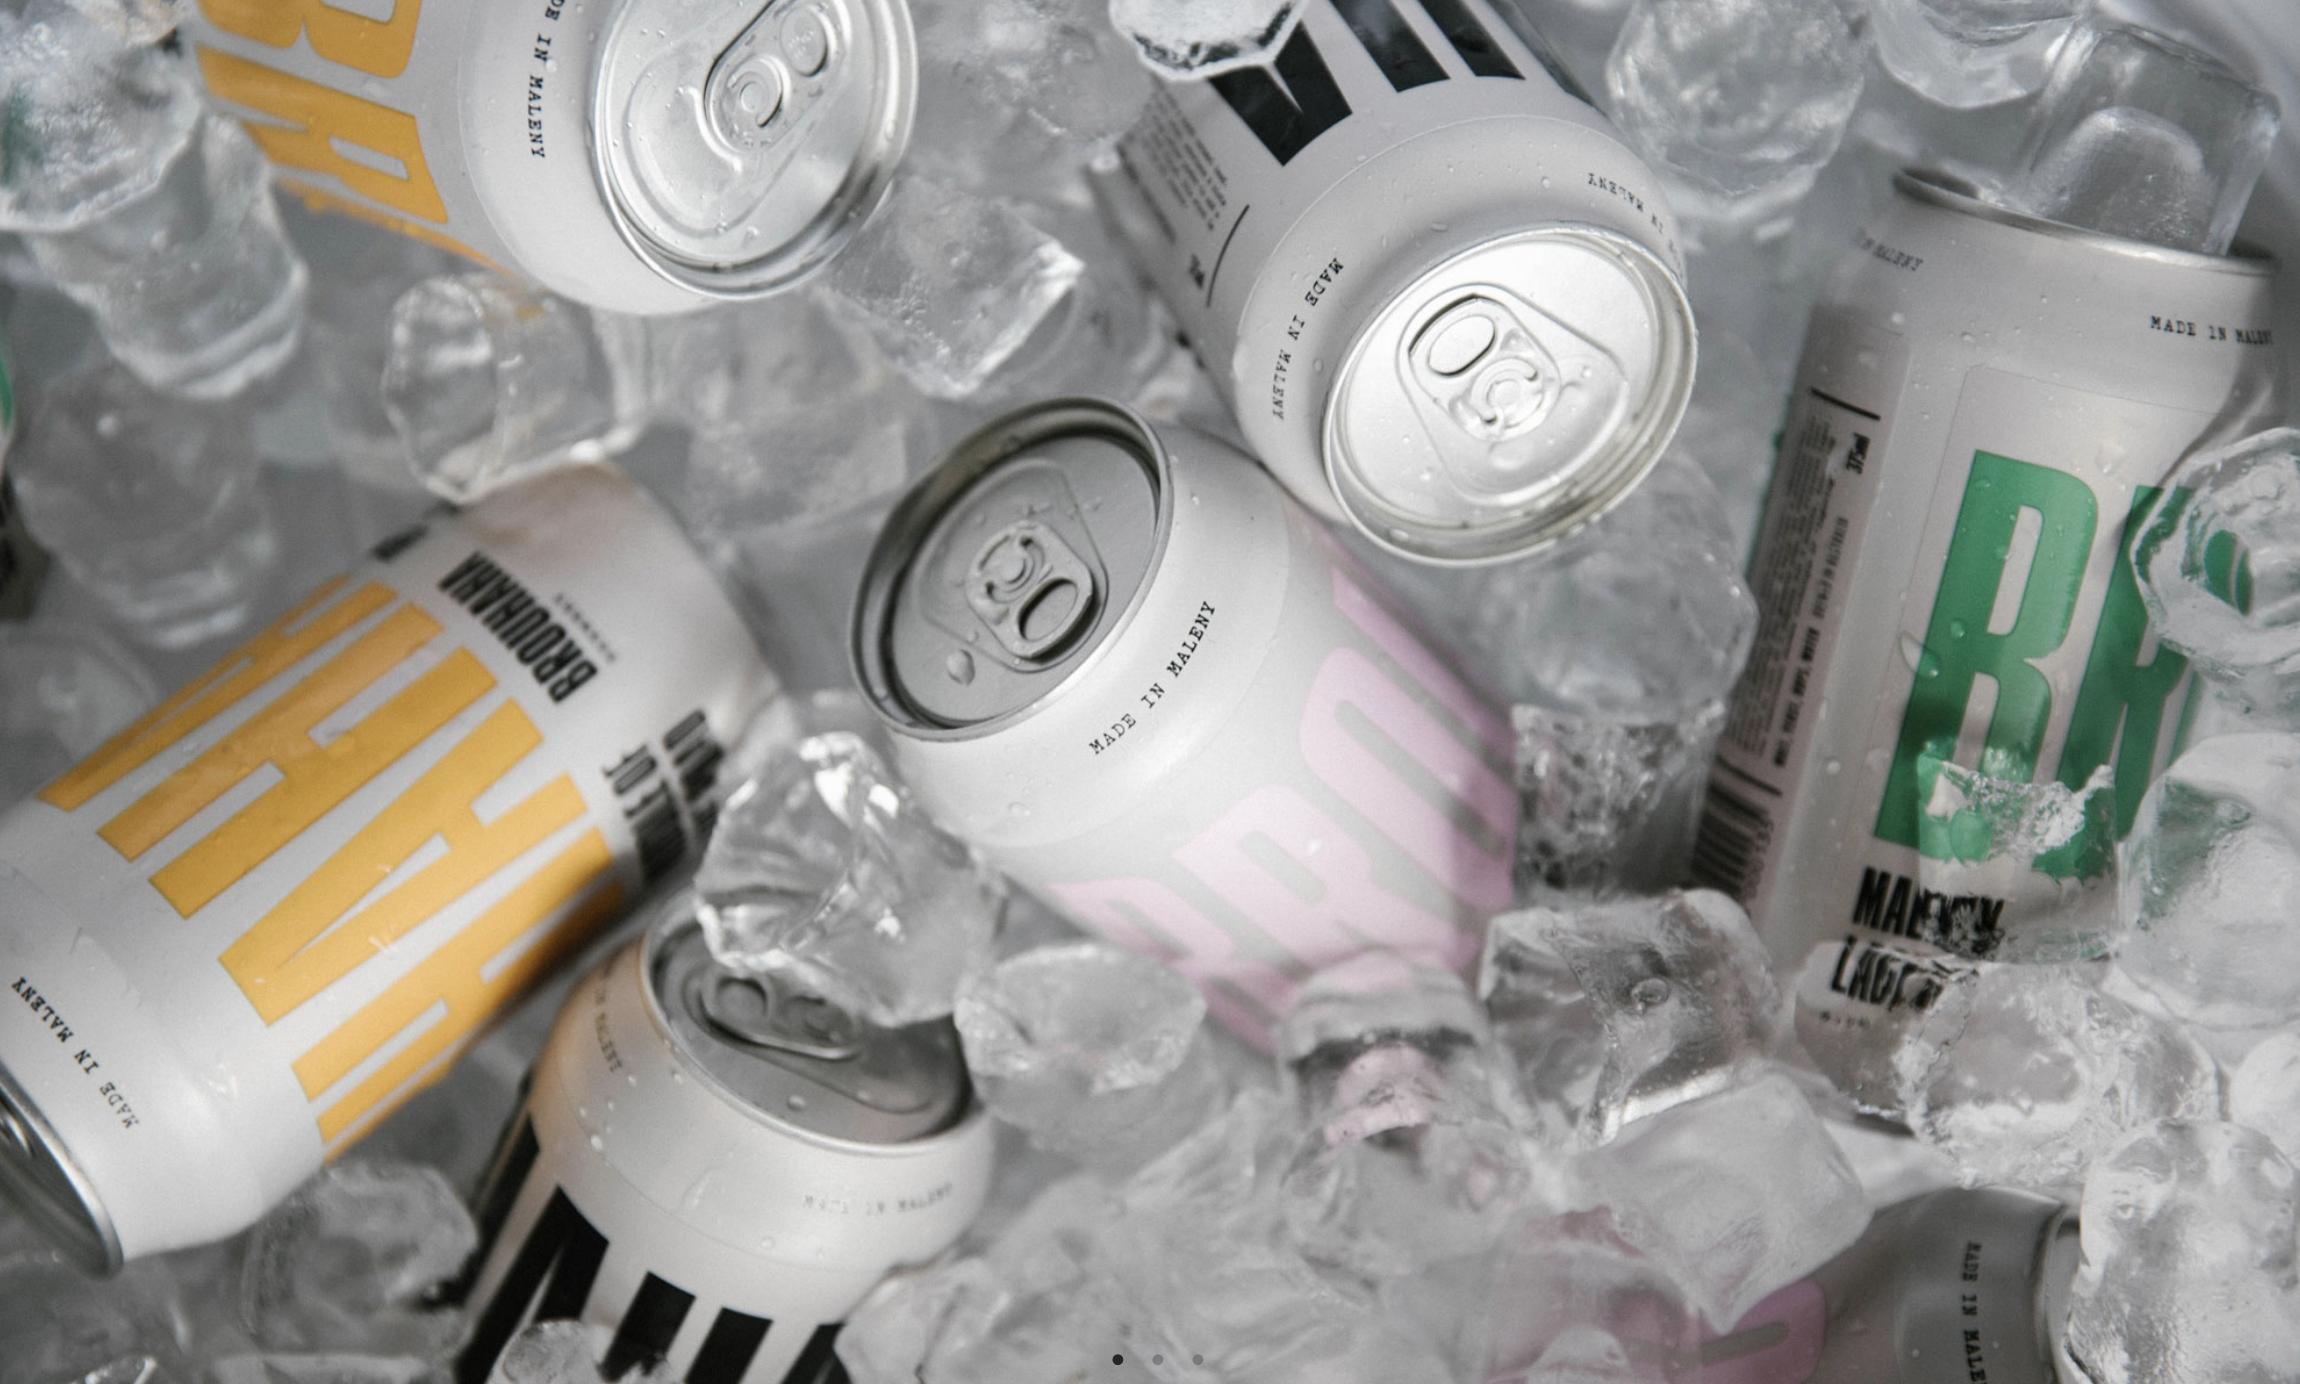 Beer & Branding: Brouhaha Brewery